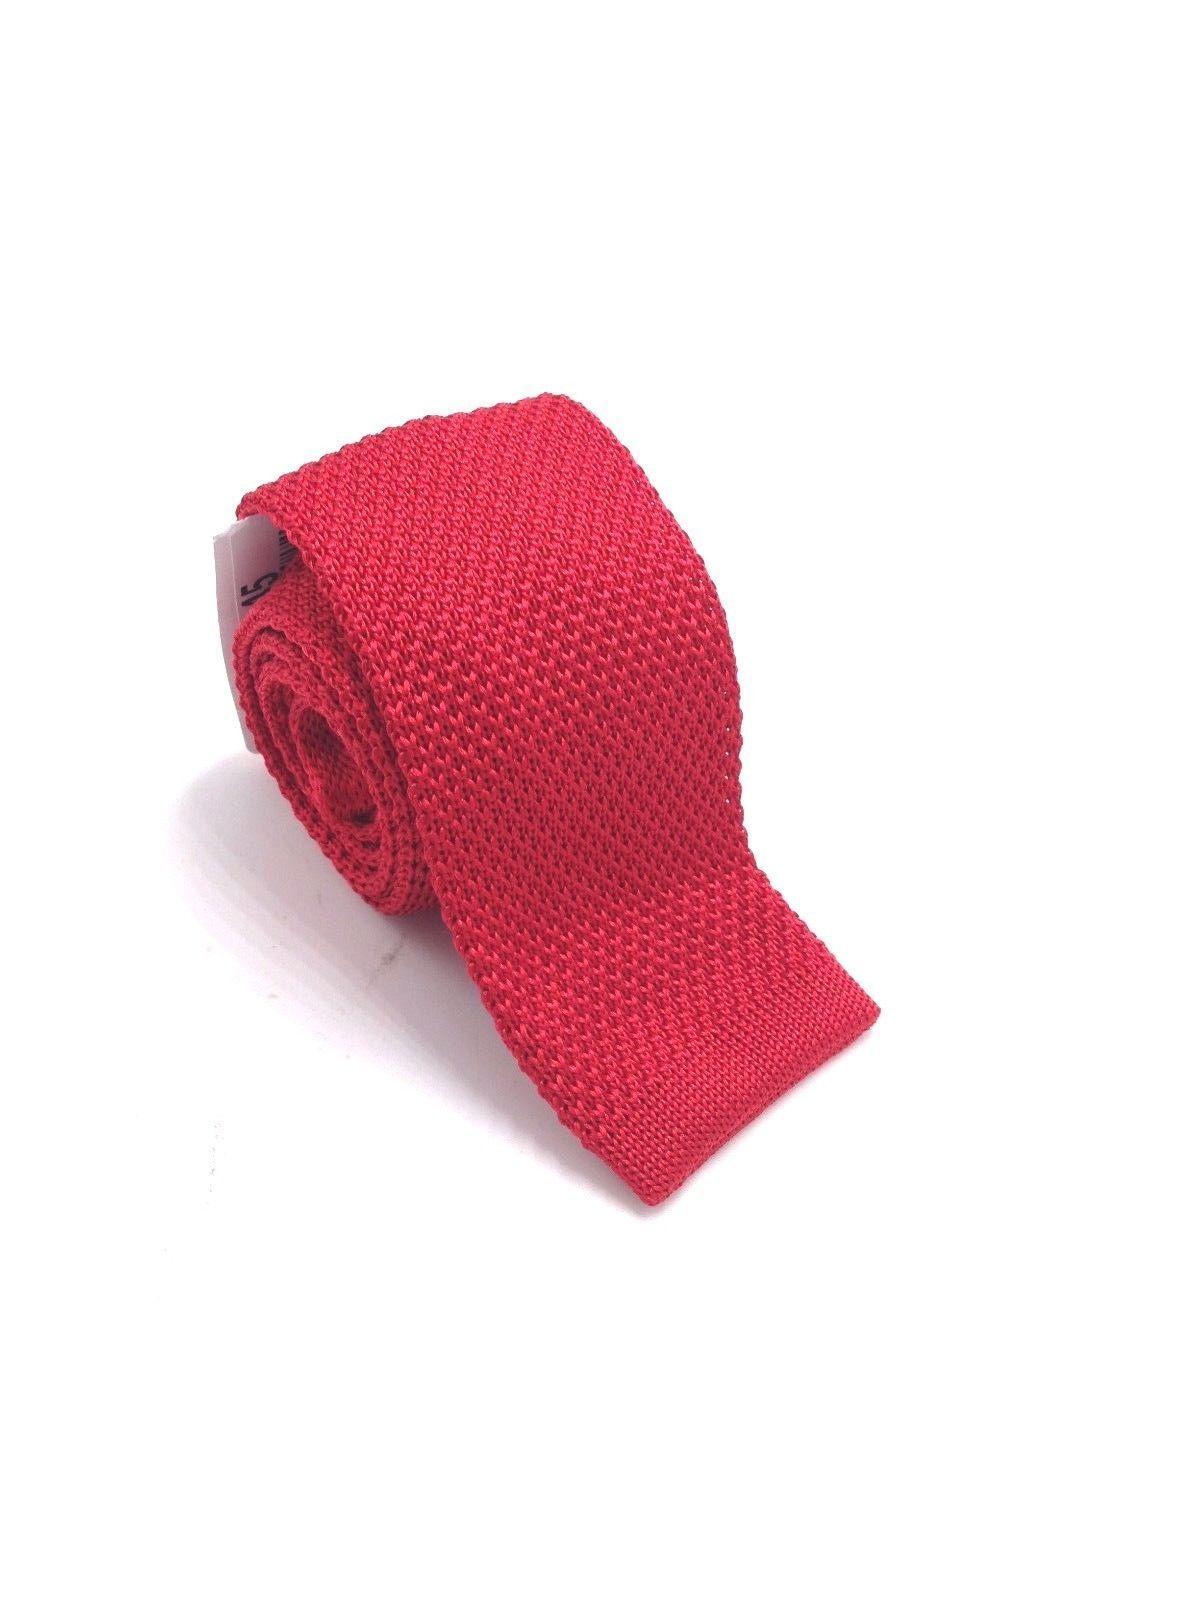 Tommy Hilfiger Knit Solid Slim Tie